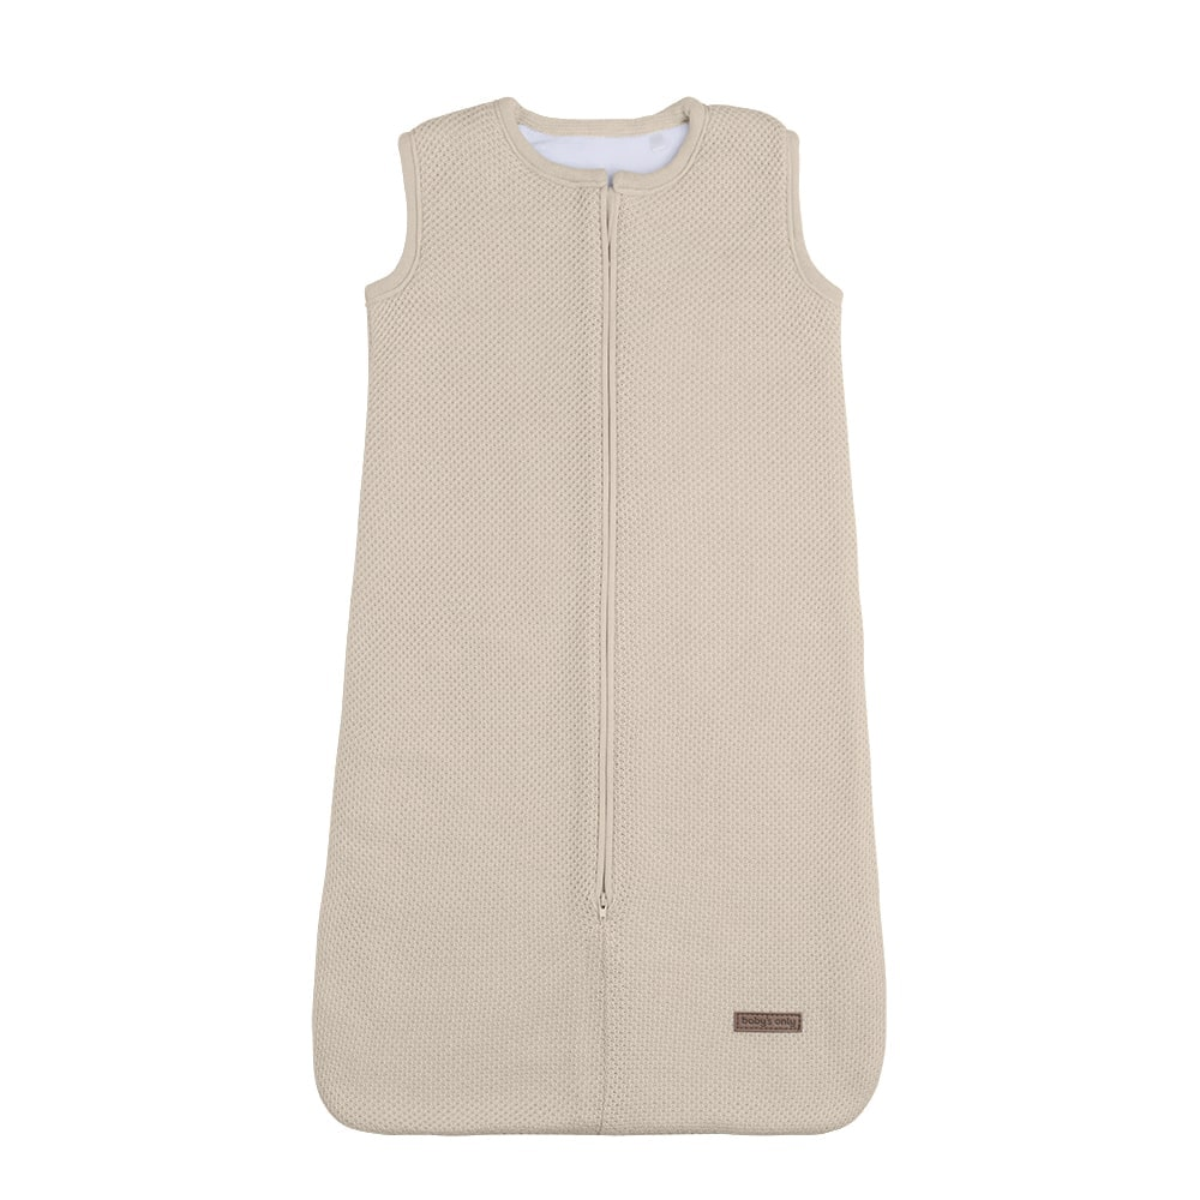 sleeping bag teddy classic sand 70 cm